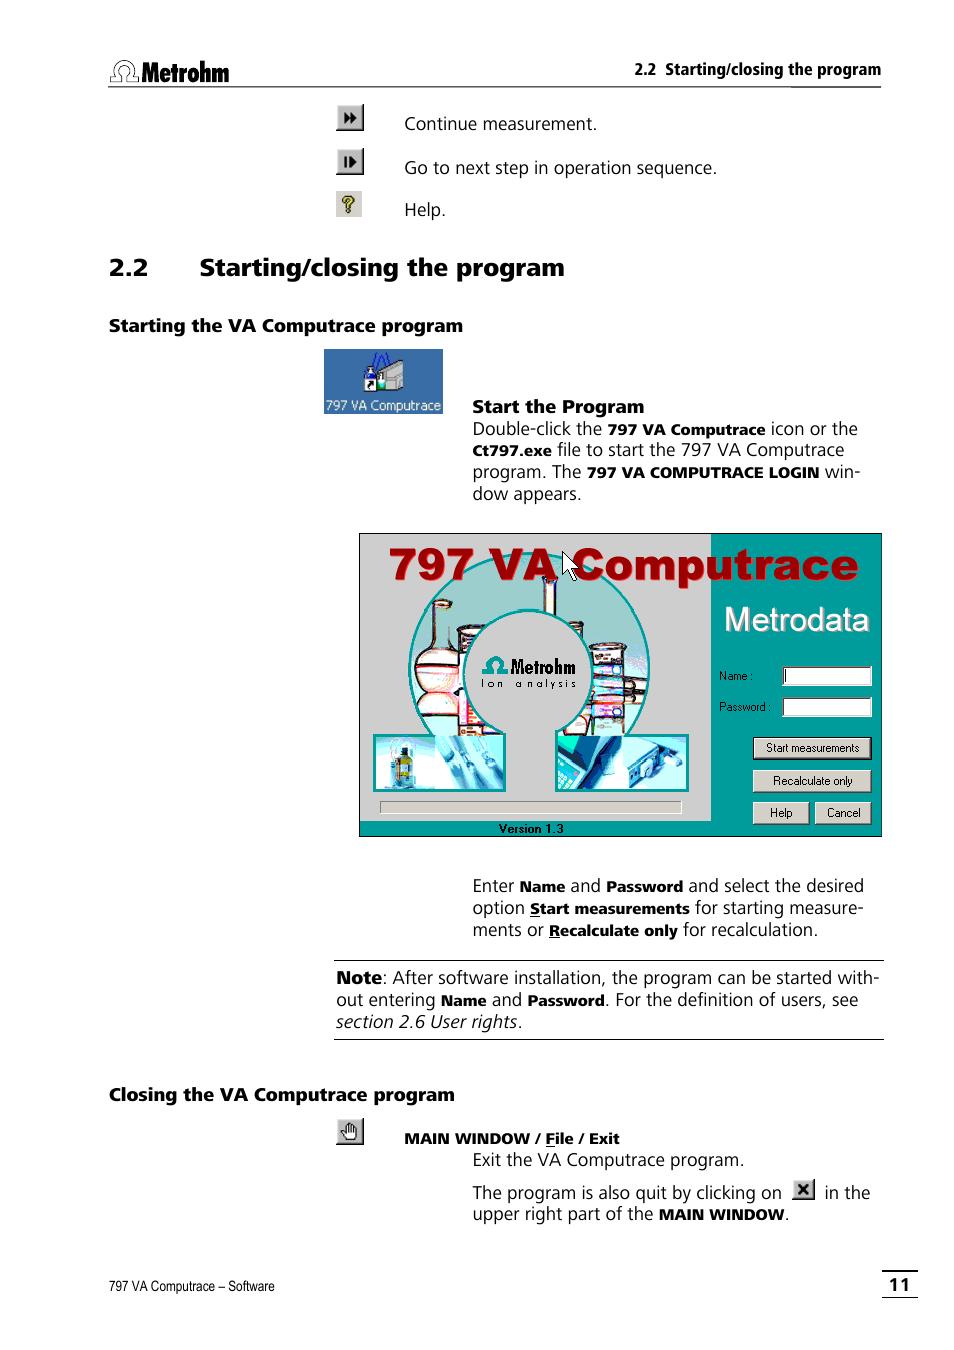 2 starting closing the program starting the va computrace program